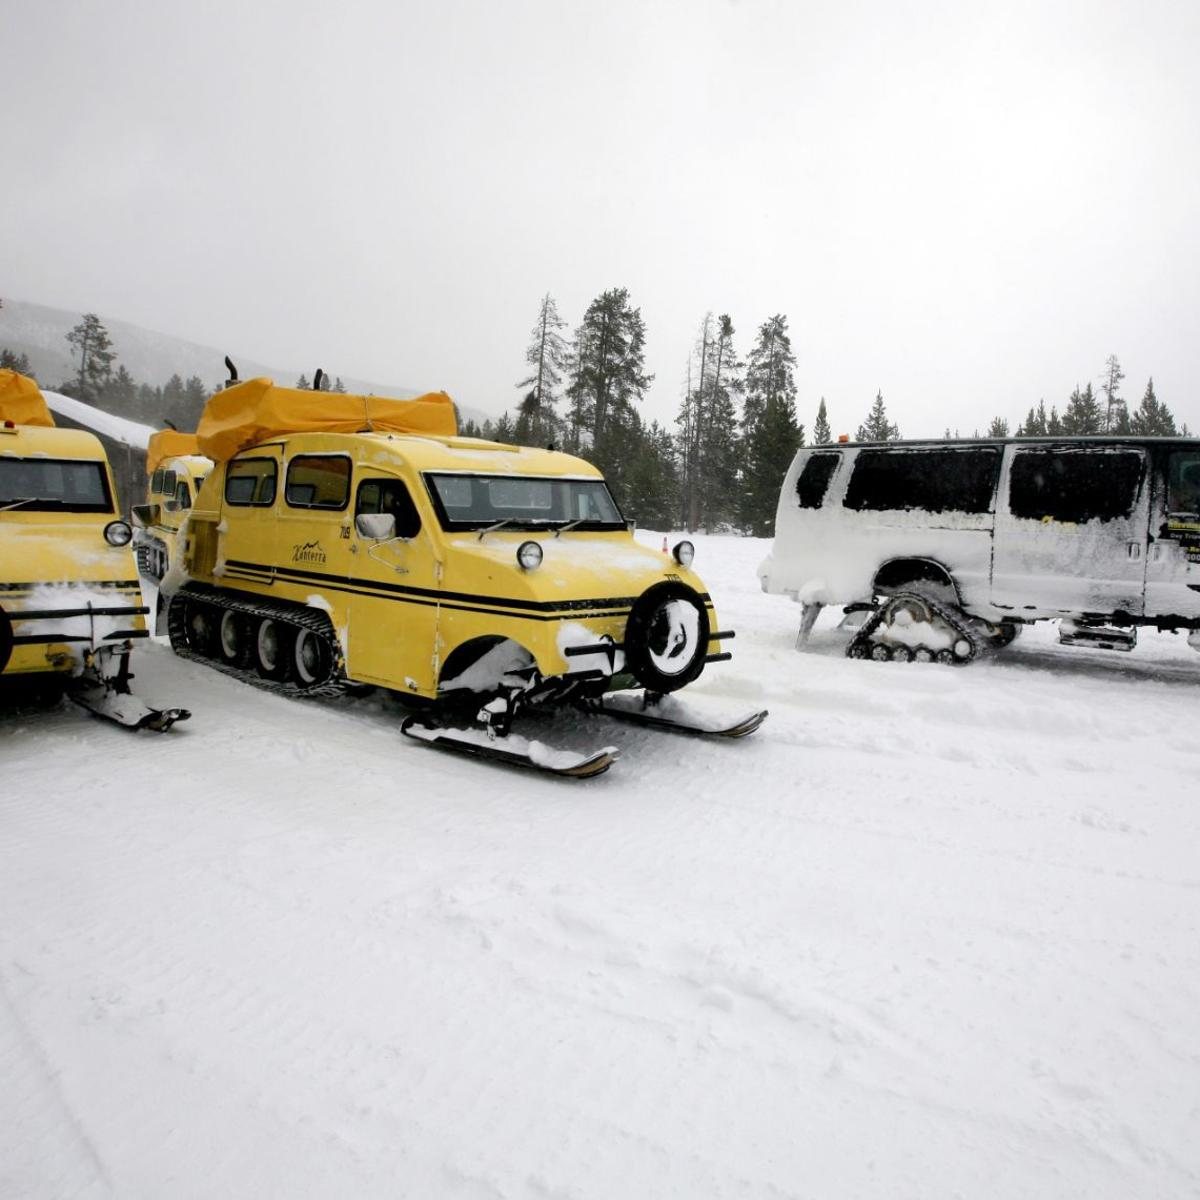 Bye, bye Bombardiers: Yellowstone concessioner retiring